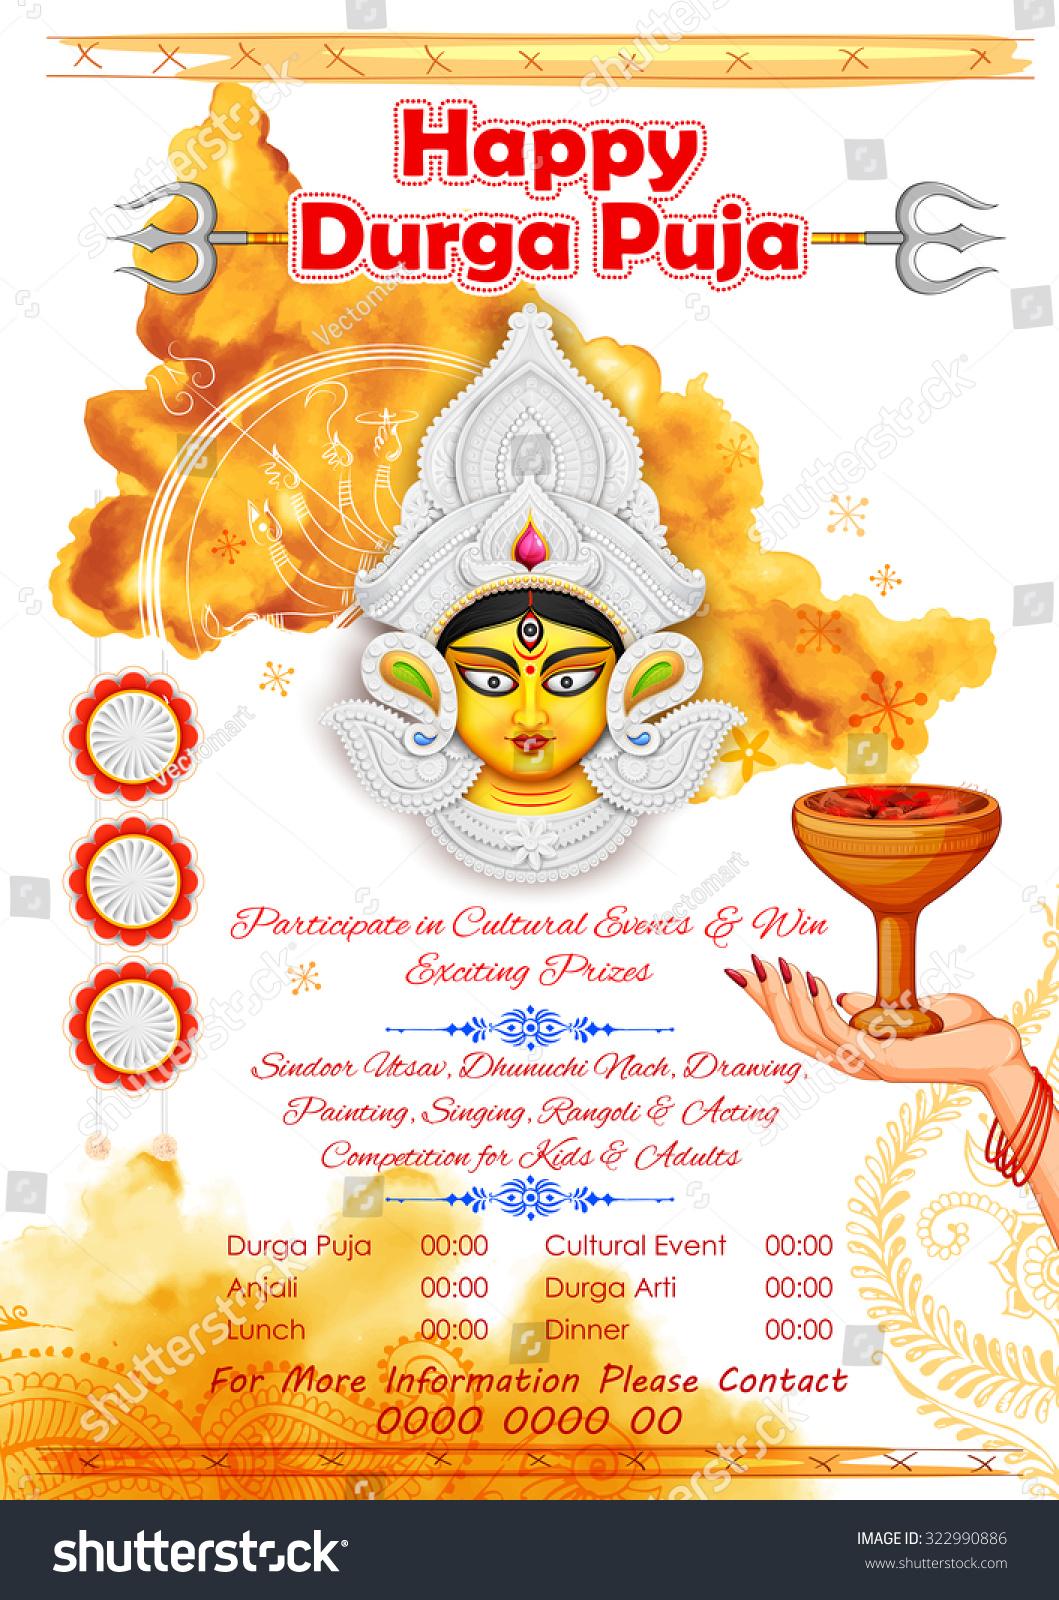 Illustration Goddess Durga Happy Durga Puja Stock Vector 322990886